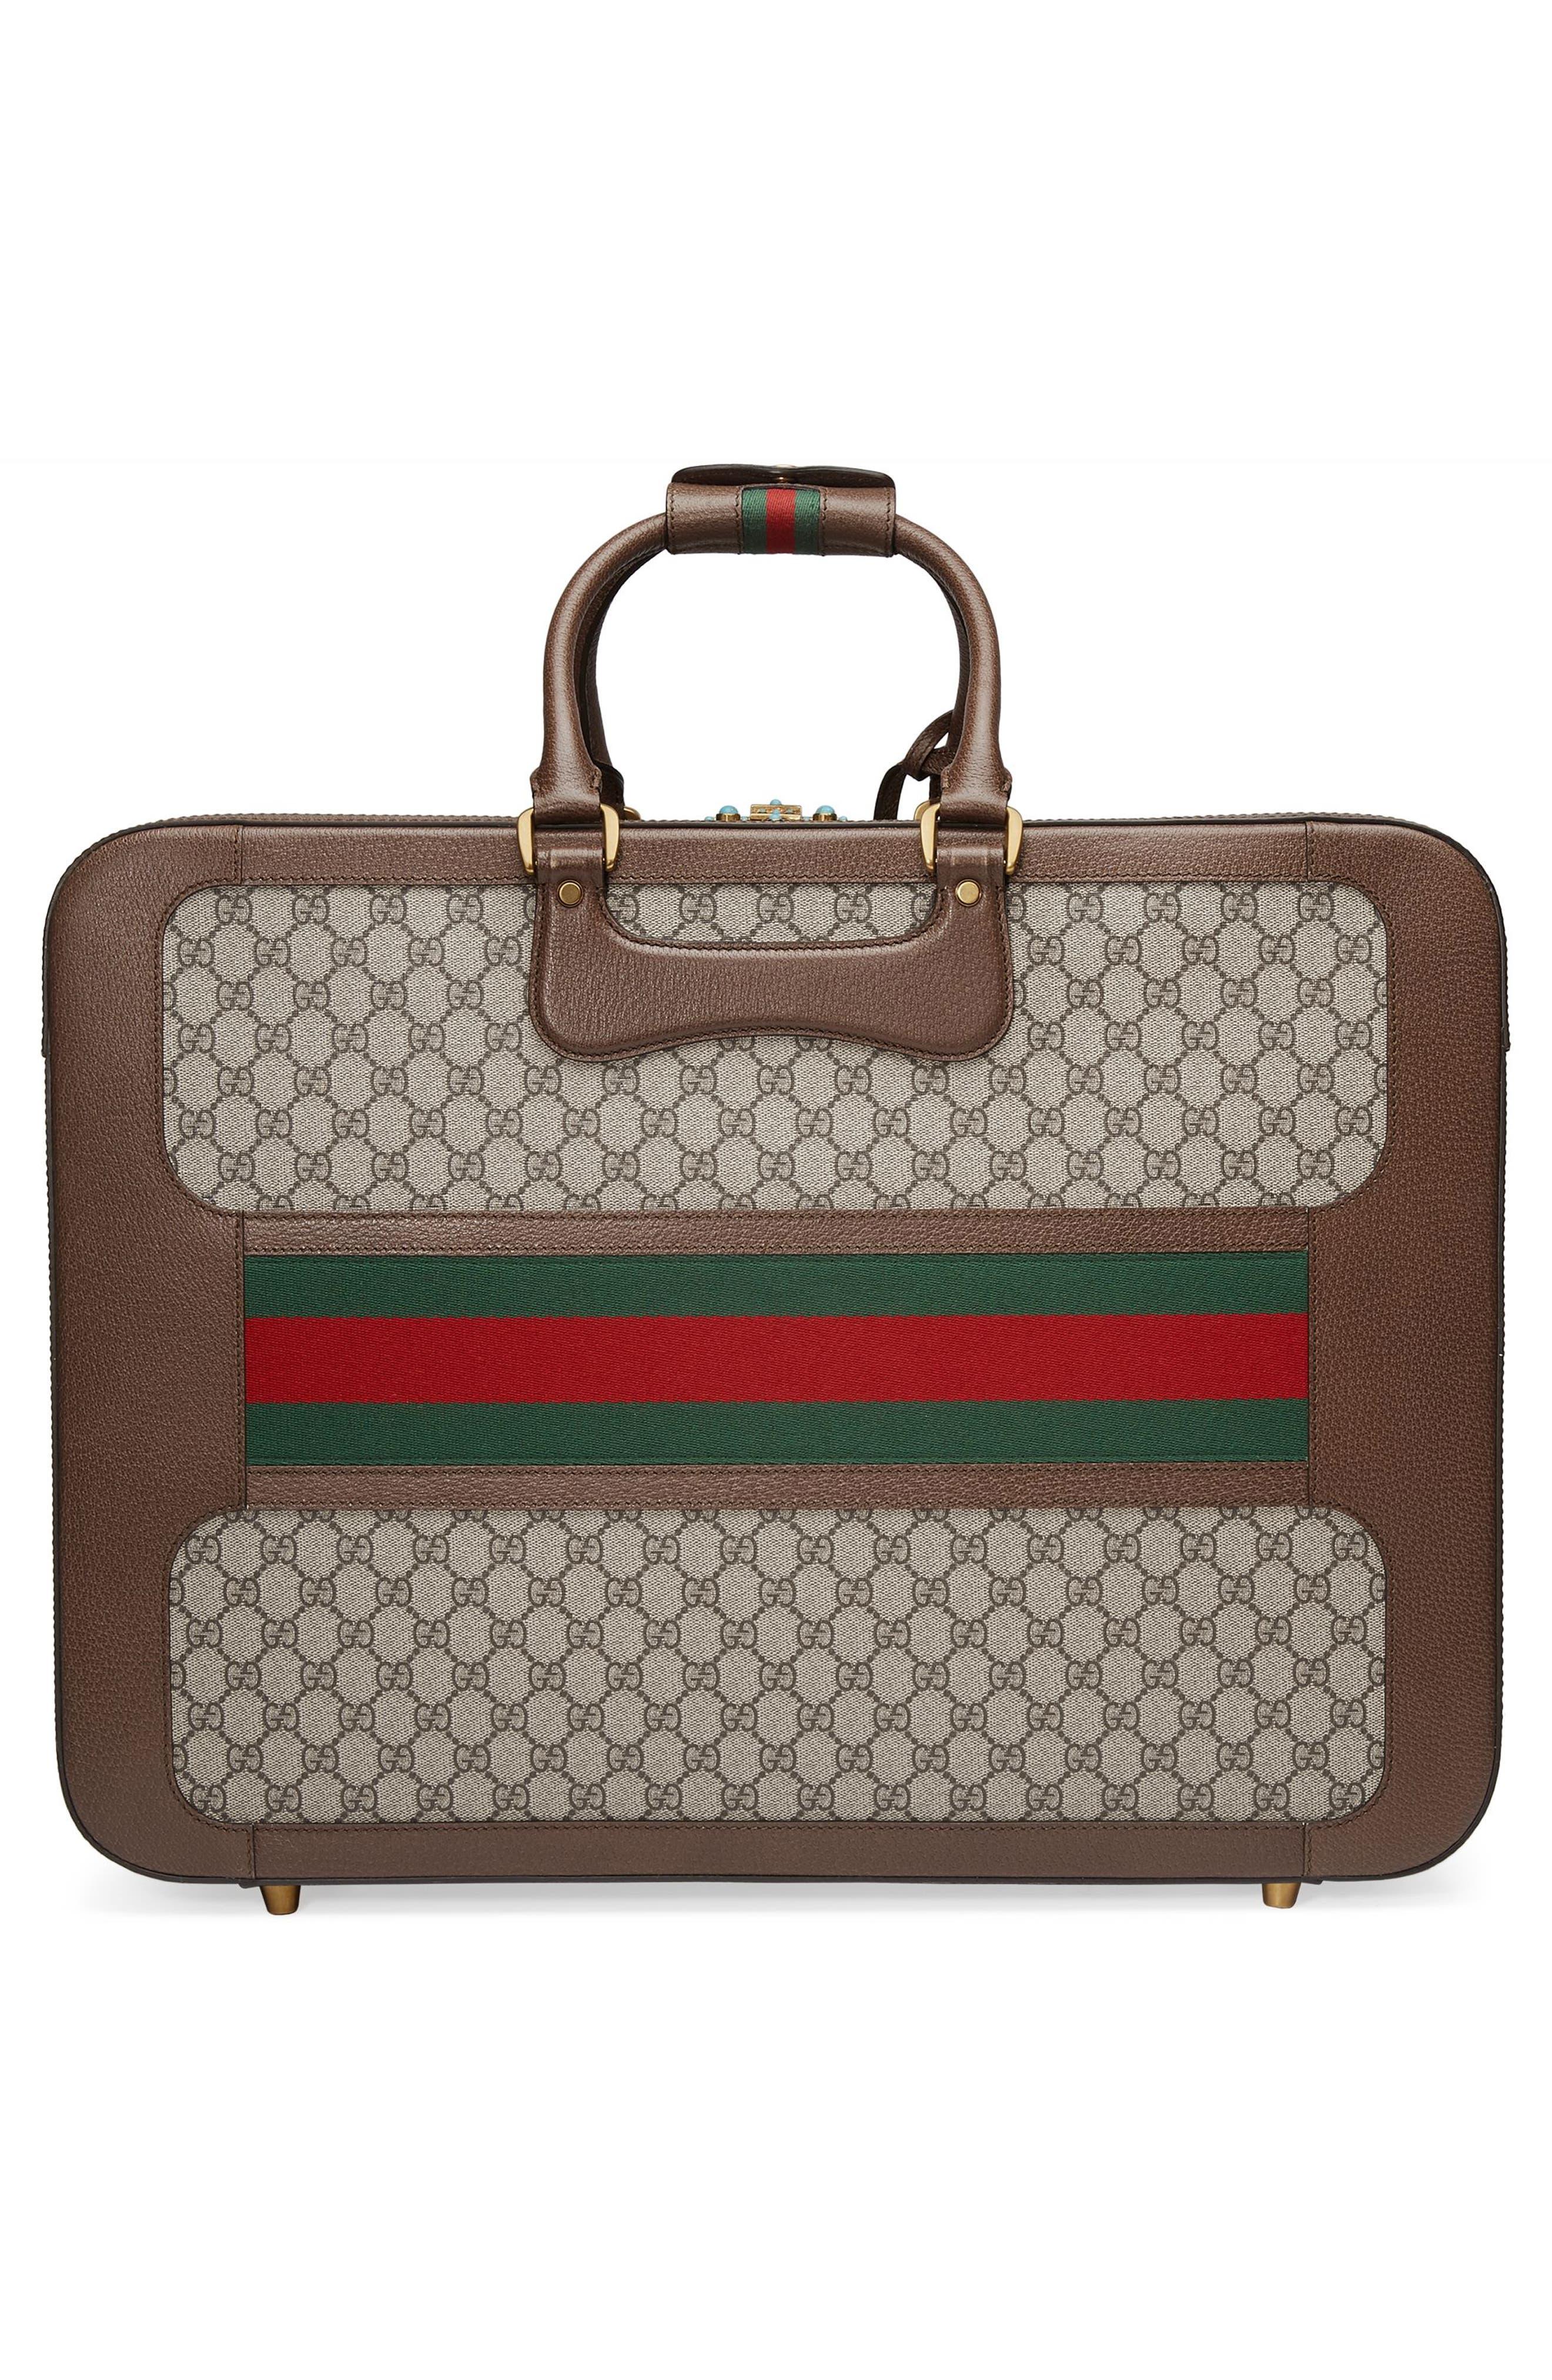 Large Echo GG Supreme Canvas & Leather Suitcase,                             Alternate thumbnail 3, color,                             Beige/ Ebony